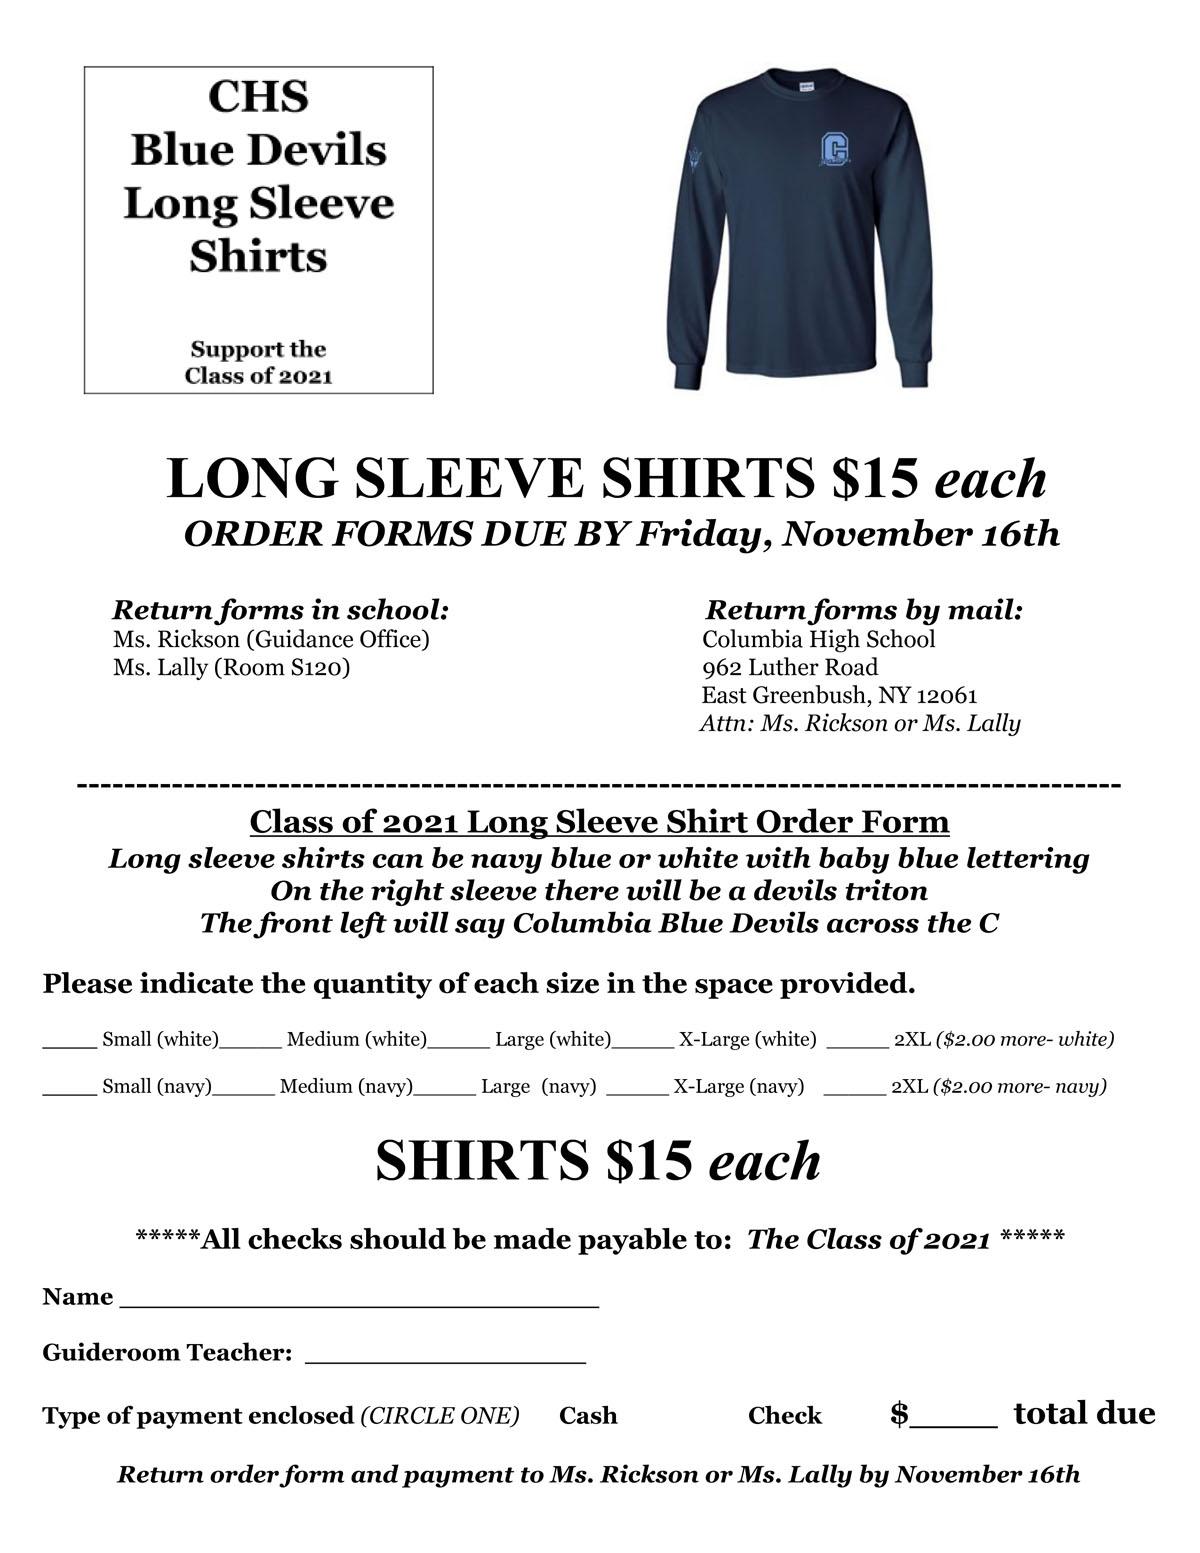 Long Sleeve Shirt Order Form